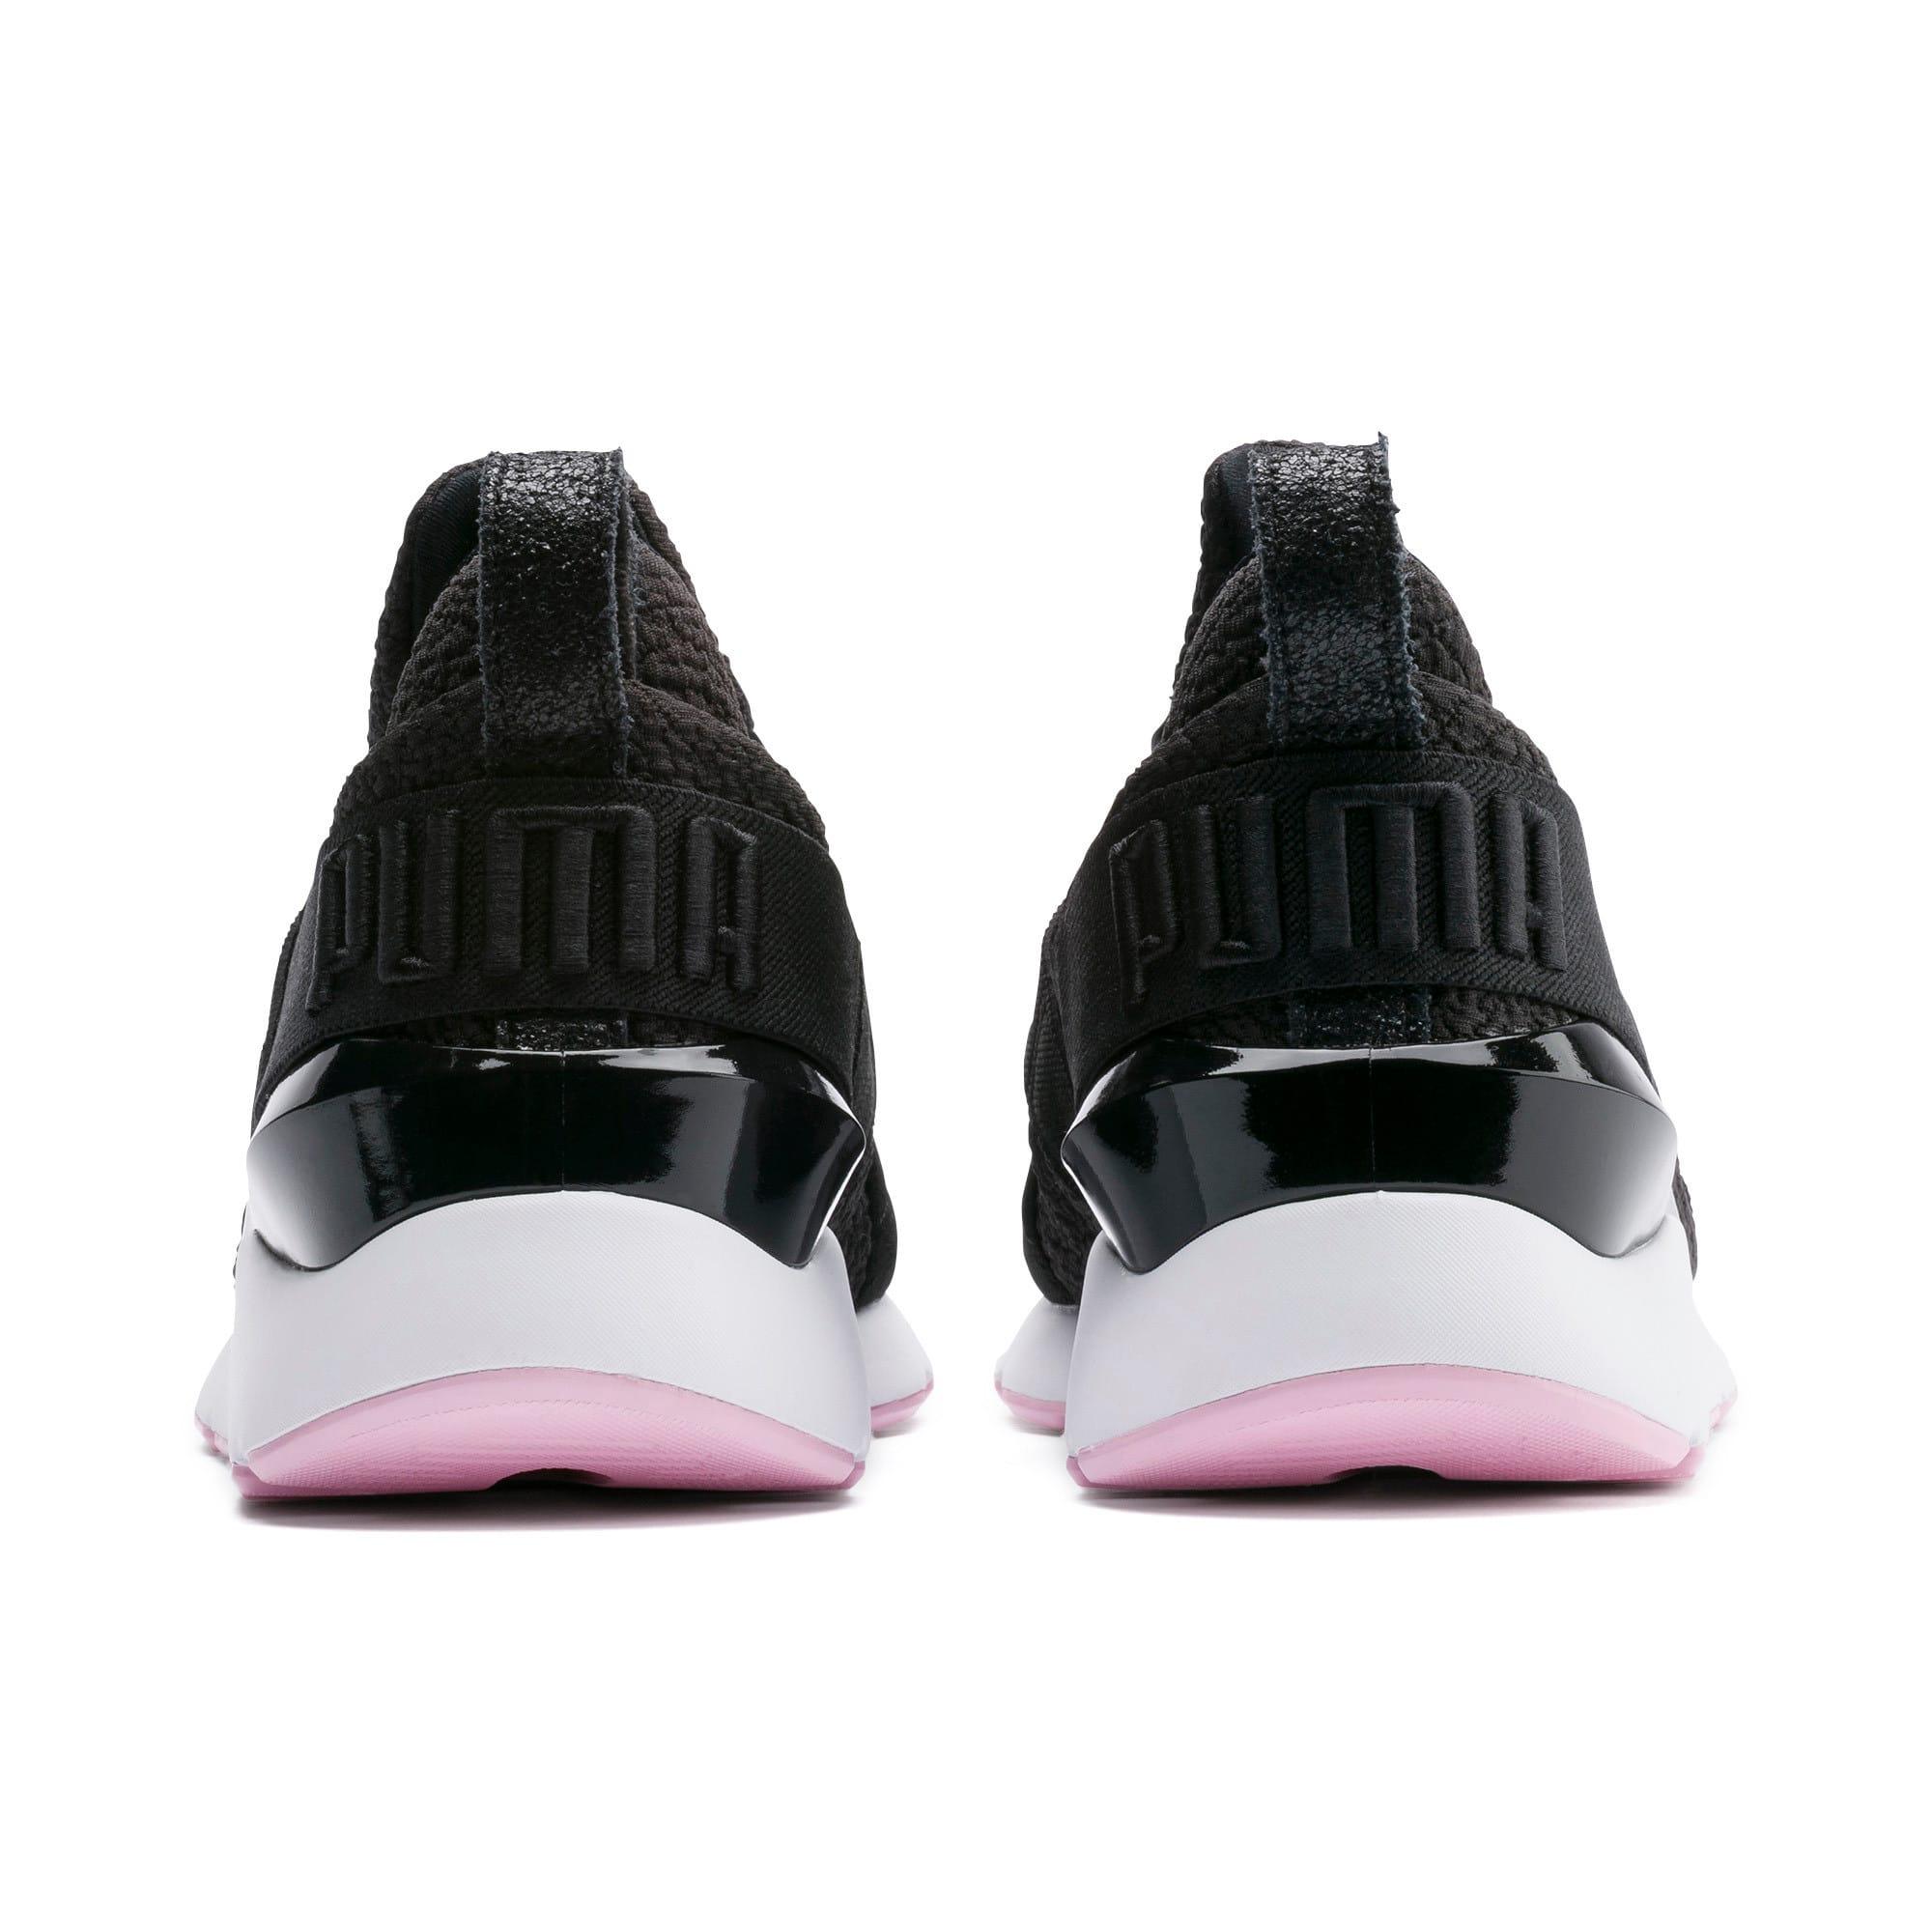 Thumbnail 3 of プーマ ミューズ TZ ウィメンズ, Puma Black-Pale Pink, medium-JPN